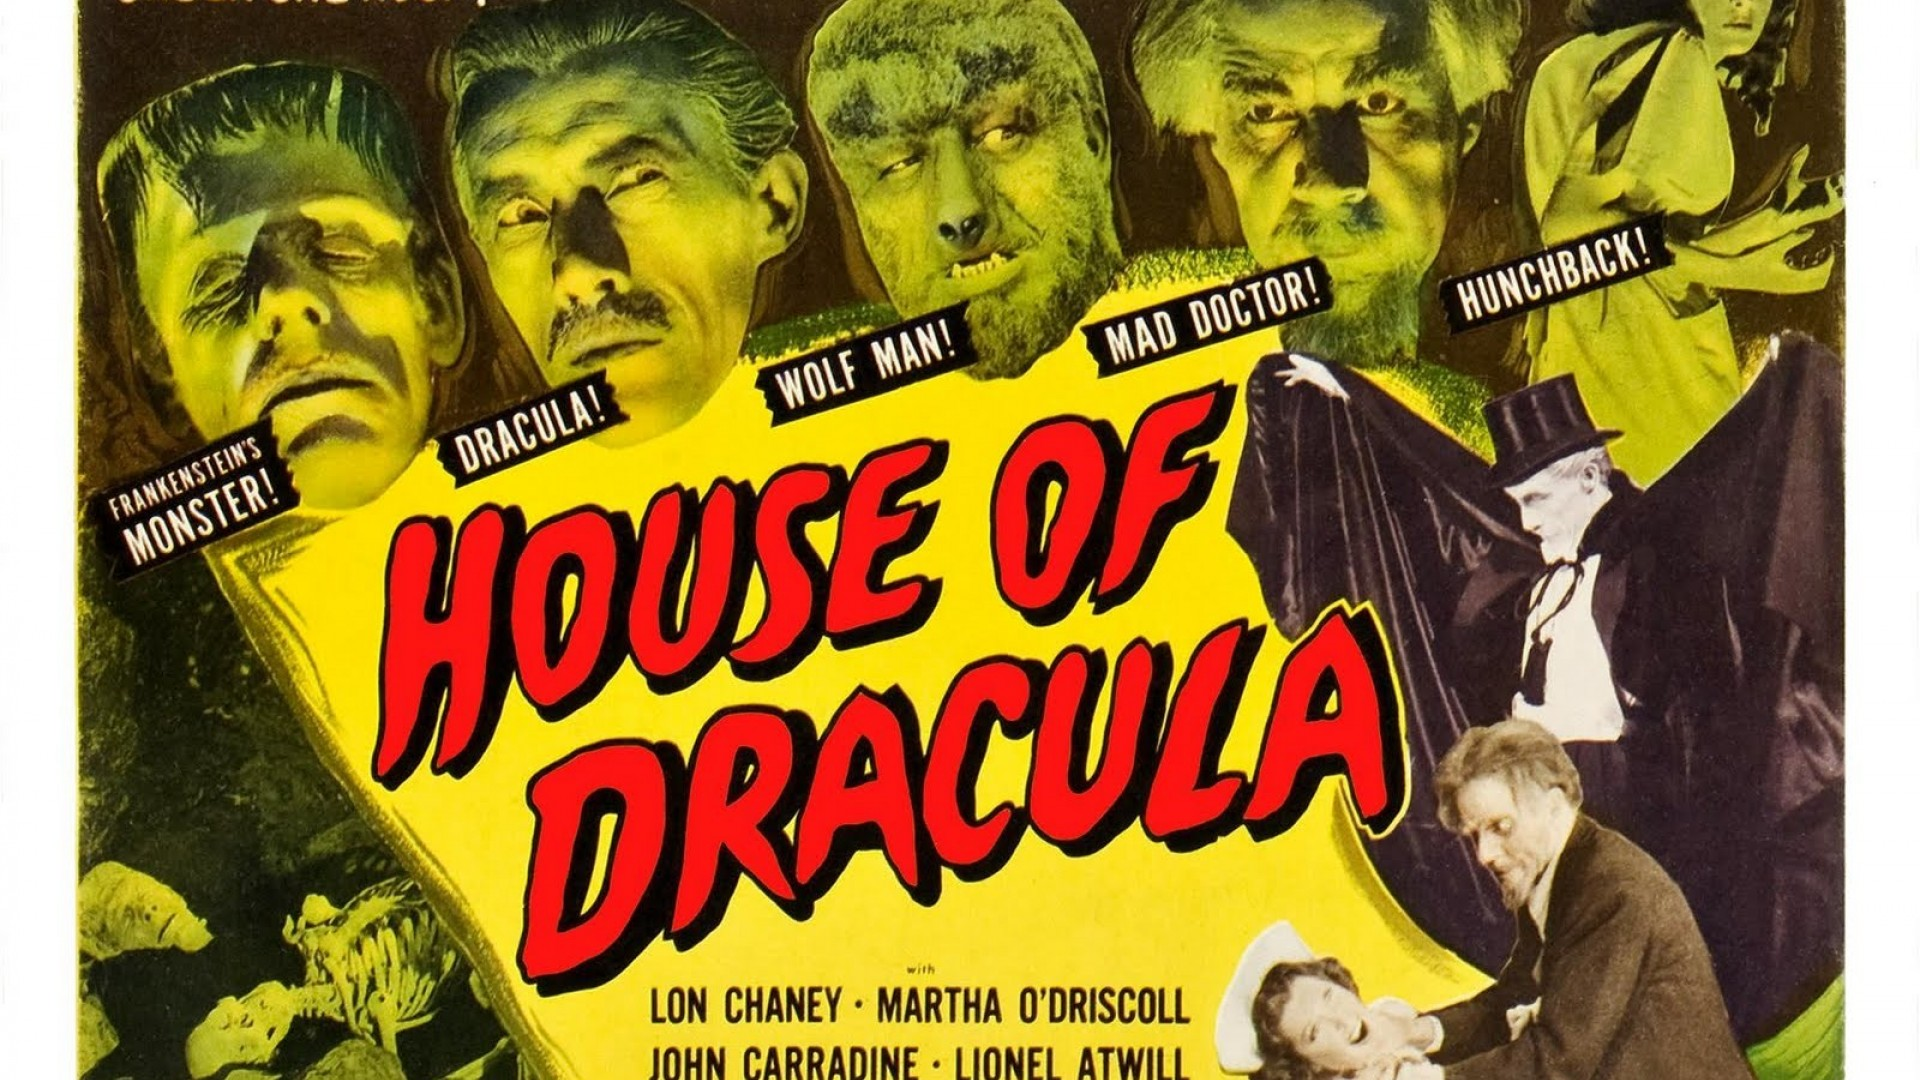 Classic Horror Movie Posters Dracula Horror vintage dracula movie 1920x1080